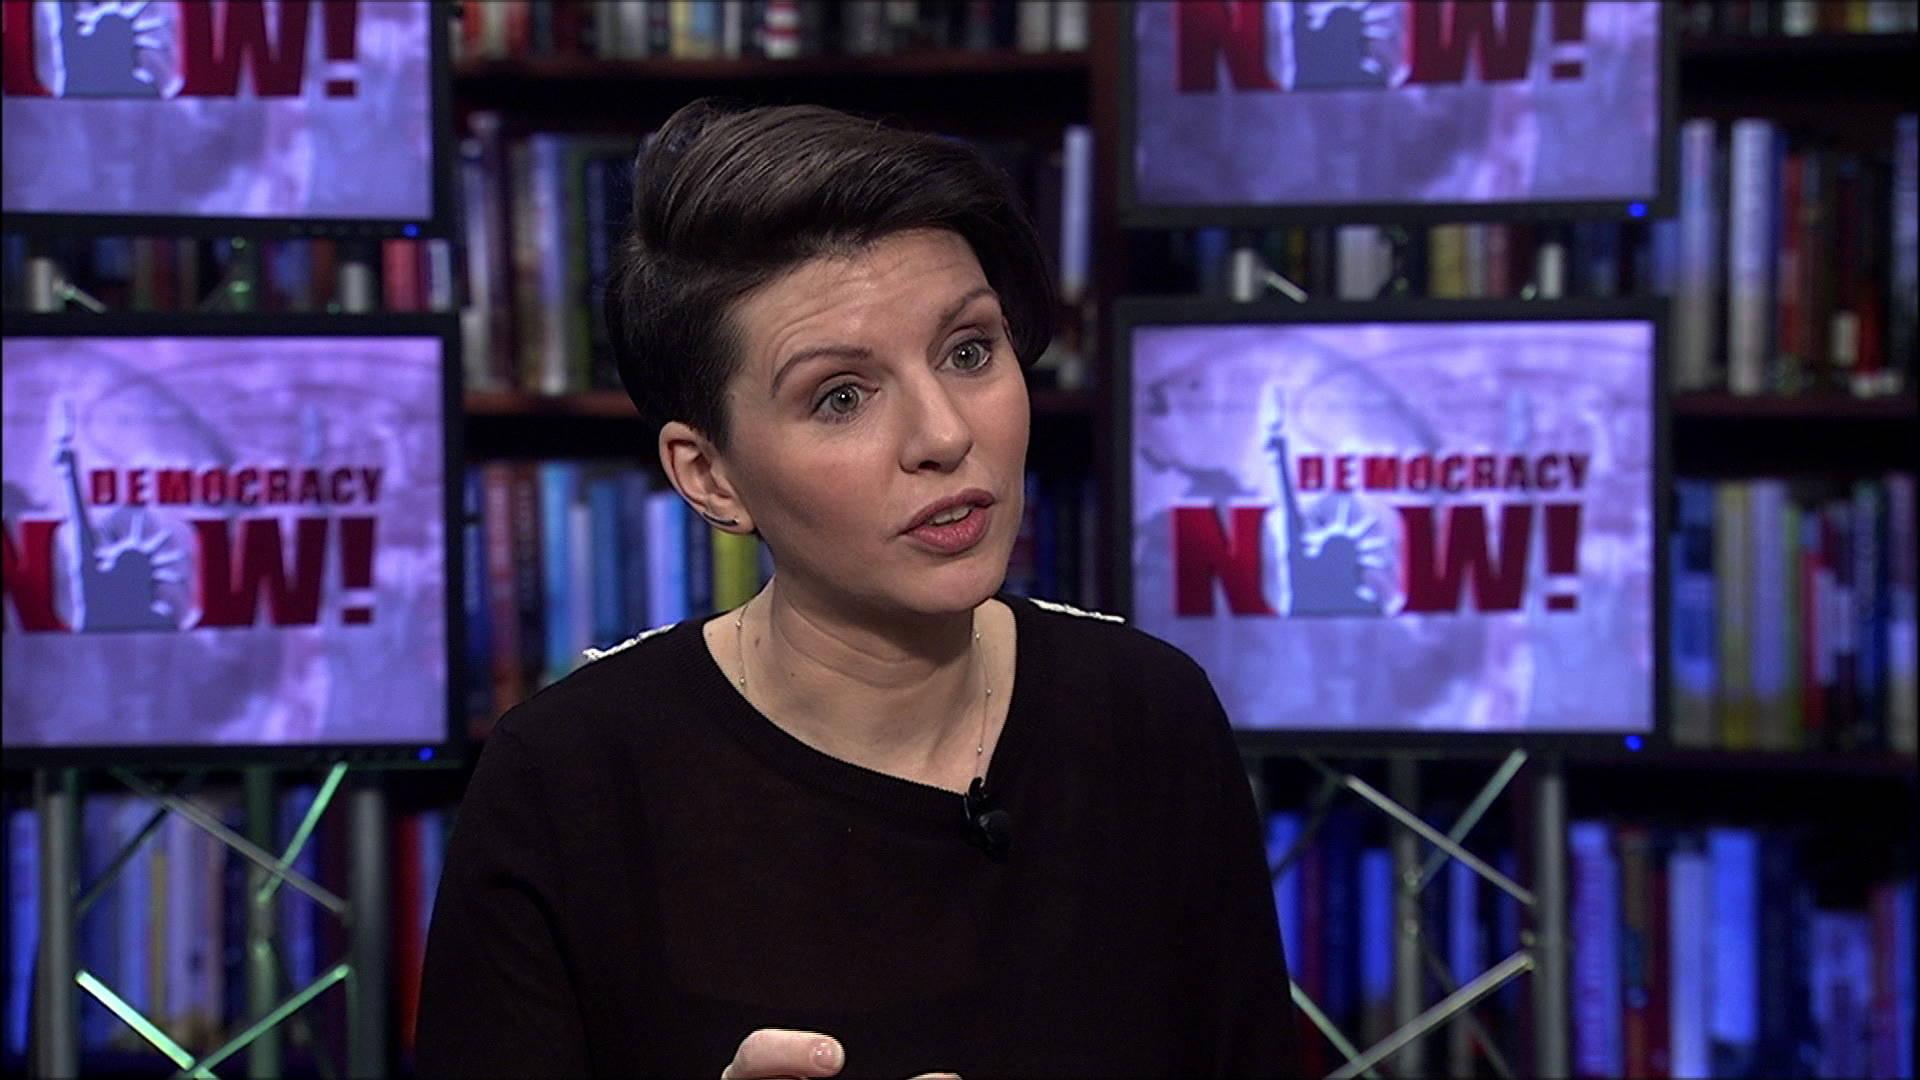 Journalist Iona Craig: The U.S. Could Stop Refueling Saudis & End Devastating War in Yemen Tomorrow